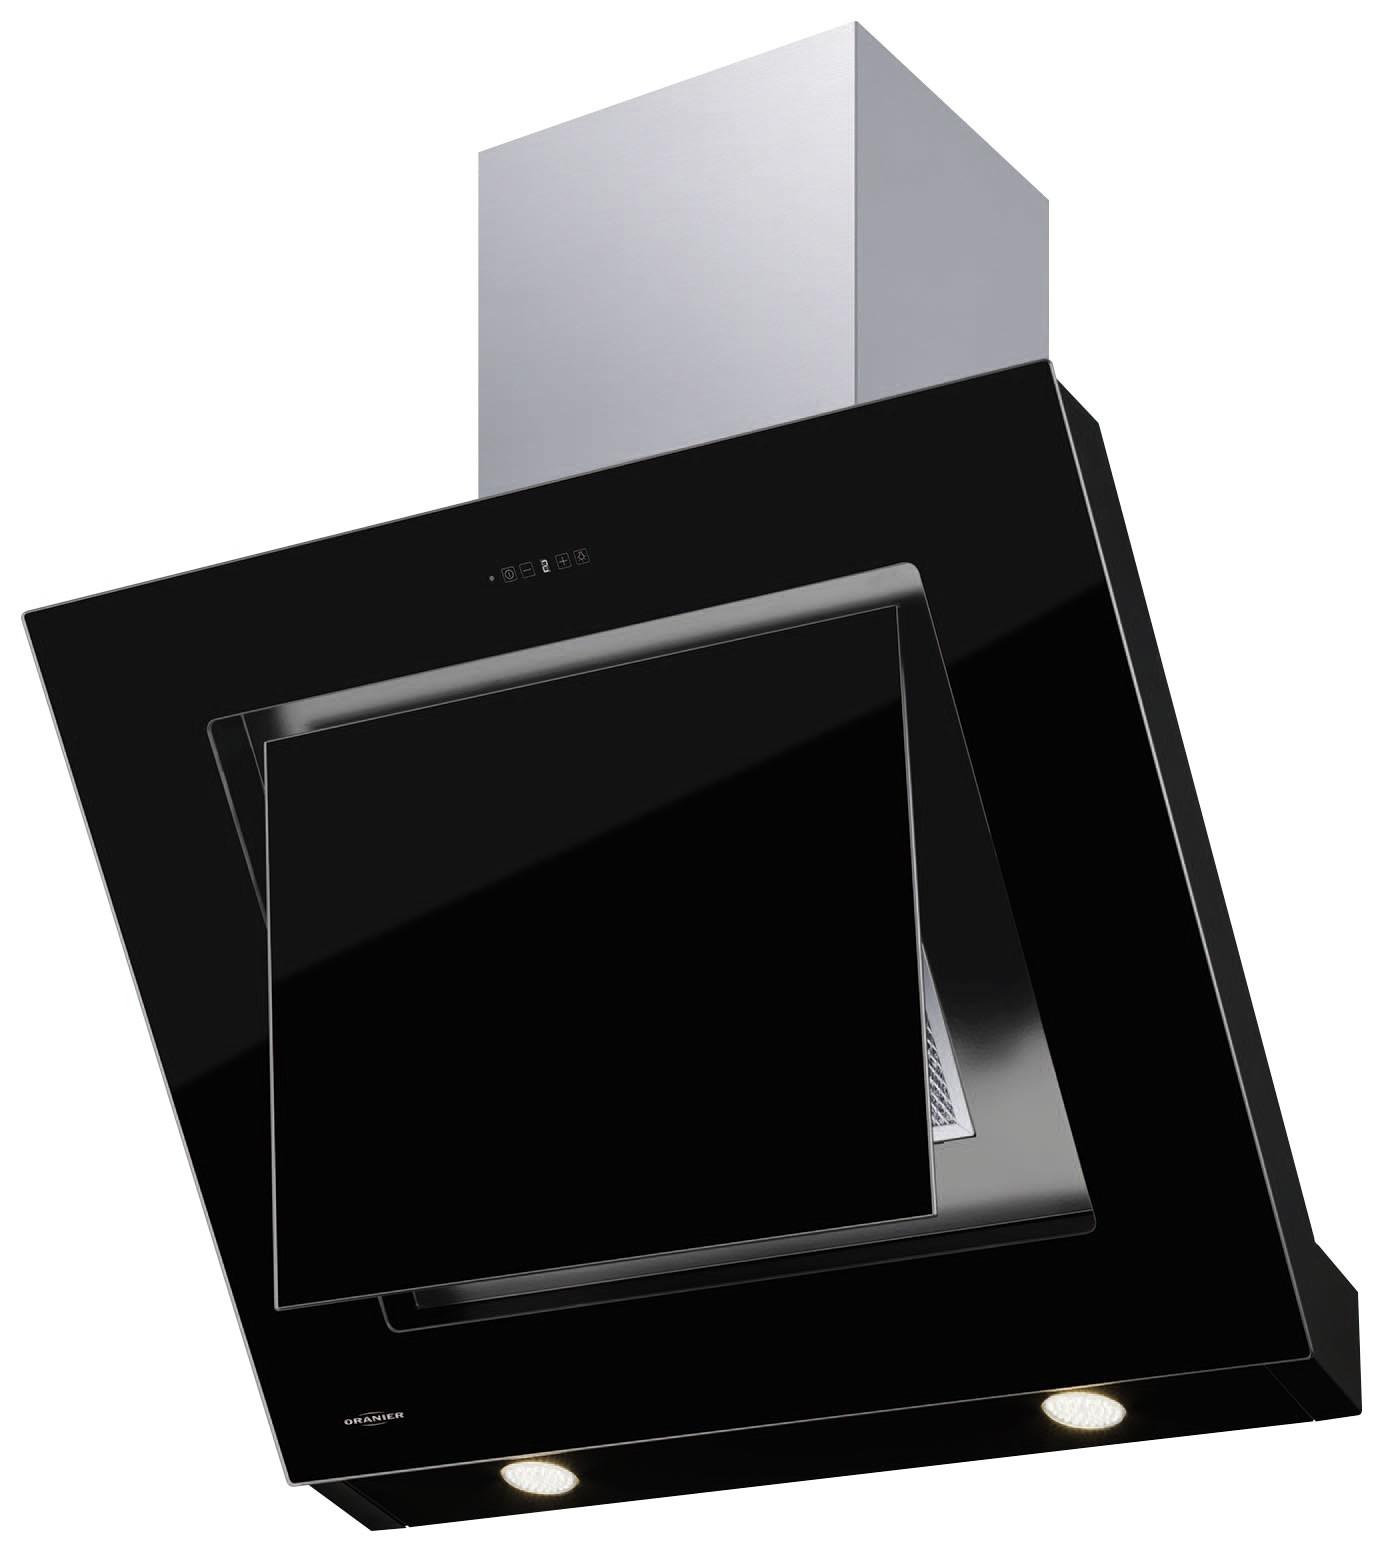 oranier lara 90 s kopffrei wandhaube dunstabzugshaube edelstahl schwarz ebay. Black Bedroom Furniture Sets. Home Design Ideas